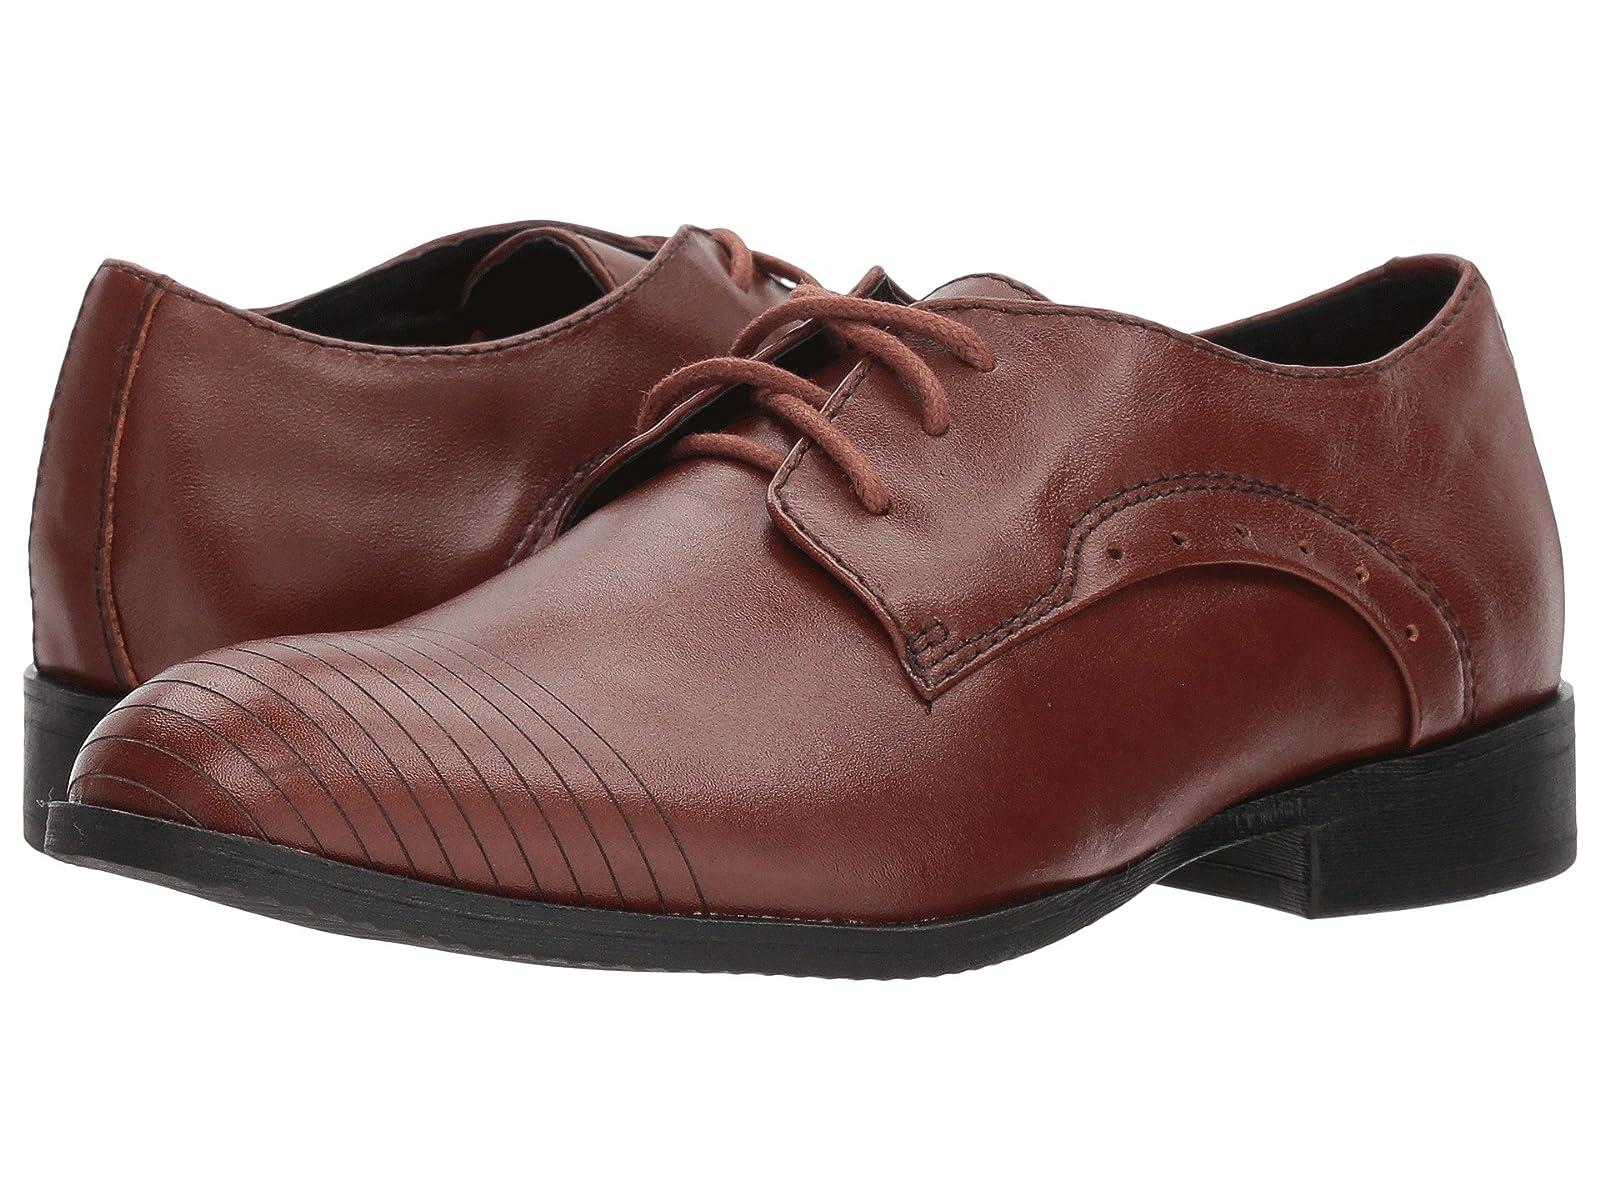 Kenneth Cole Reaction Kids Straight Line (Little Kid/Big Kid)Atmospheric grades have affordable shoes